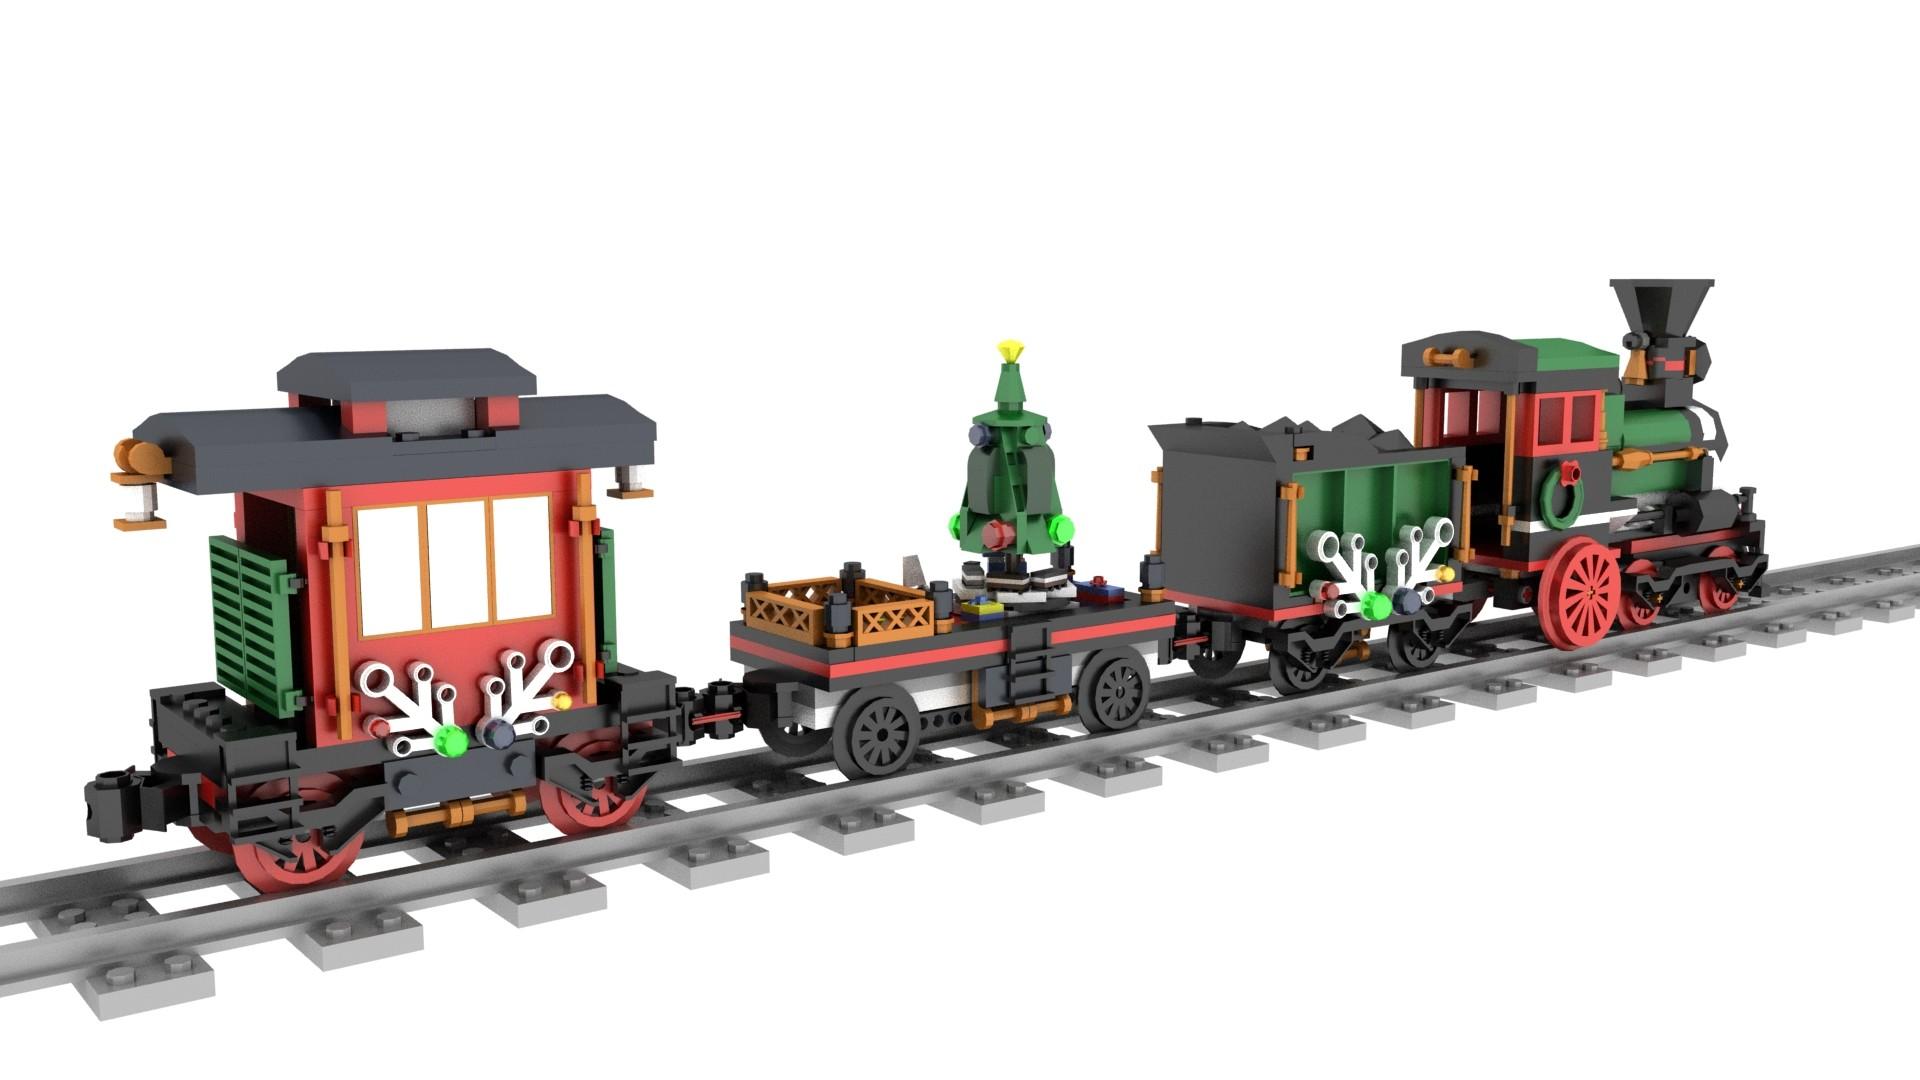 Lego Christmas Train.Tavo Romero Lego Christmas Train